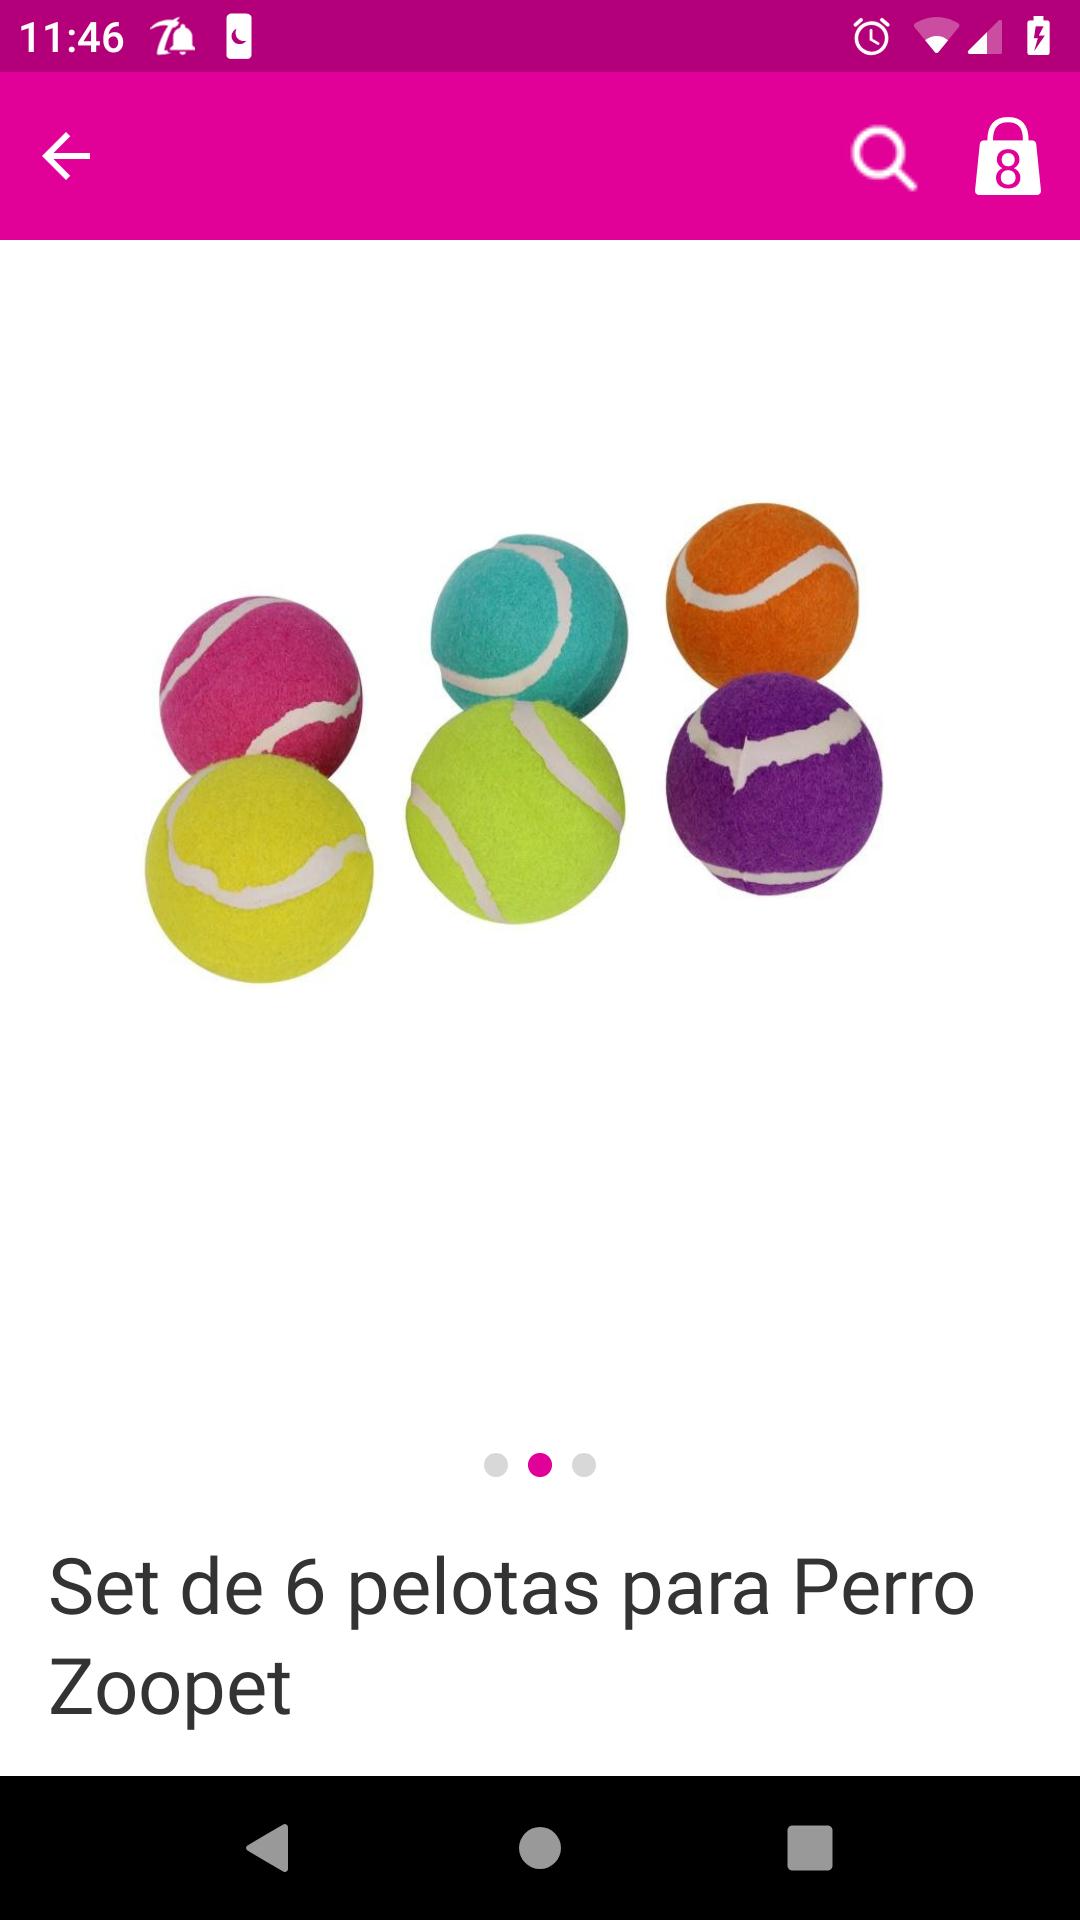 Liverpool : set de 6 pelotas de colores para perro